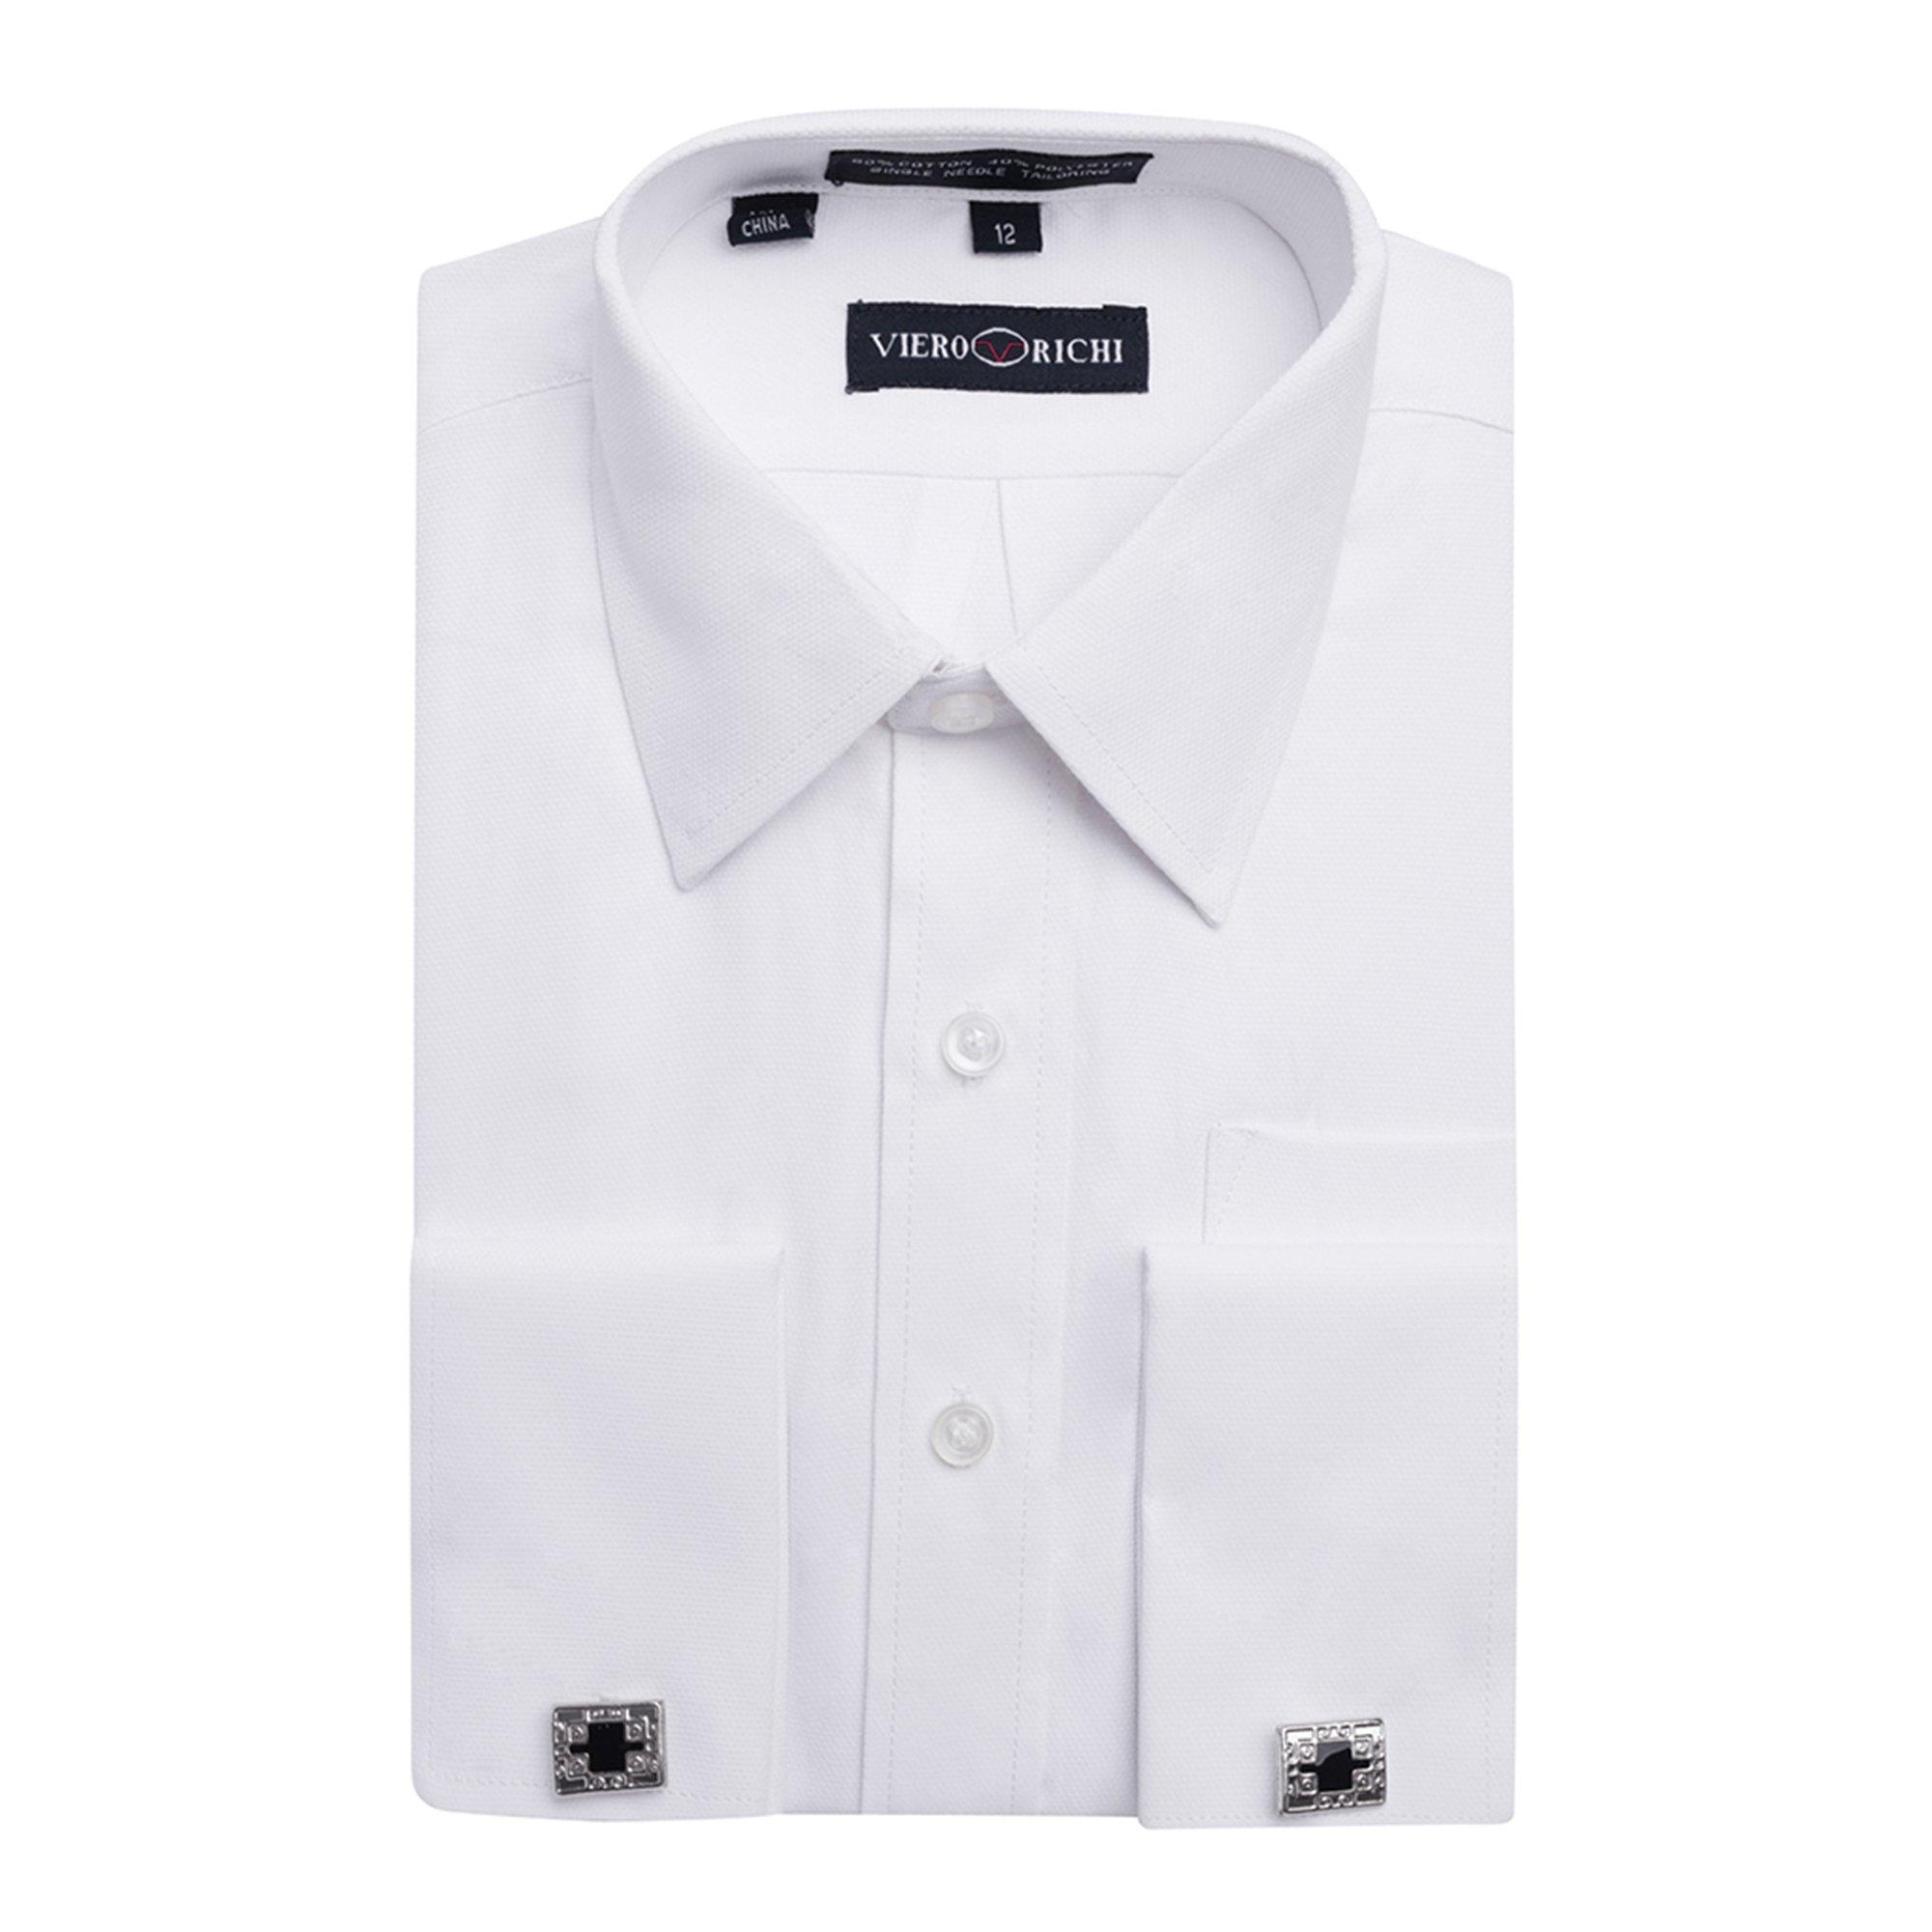 Viero Richi Boys 8-20 French Cuff Dress Shirt (Cufflinks Included) Size 12 by Viero Richi